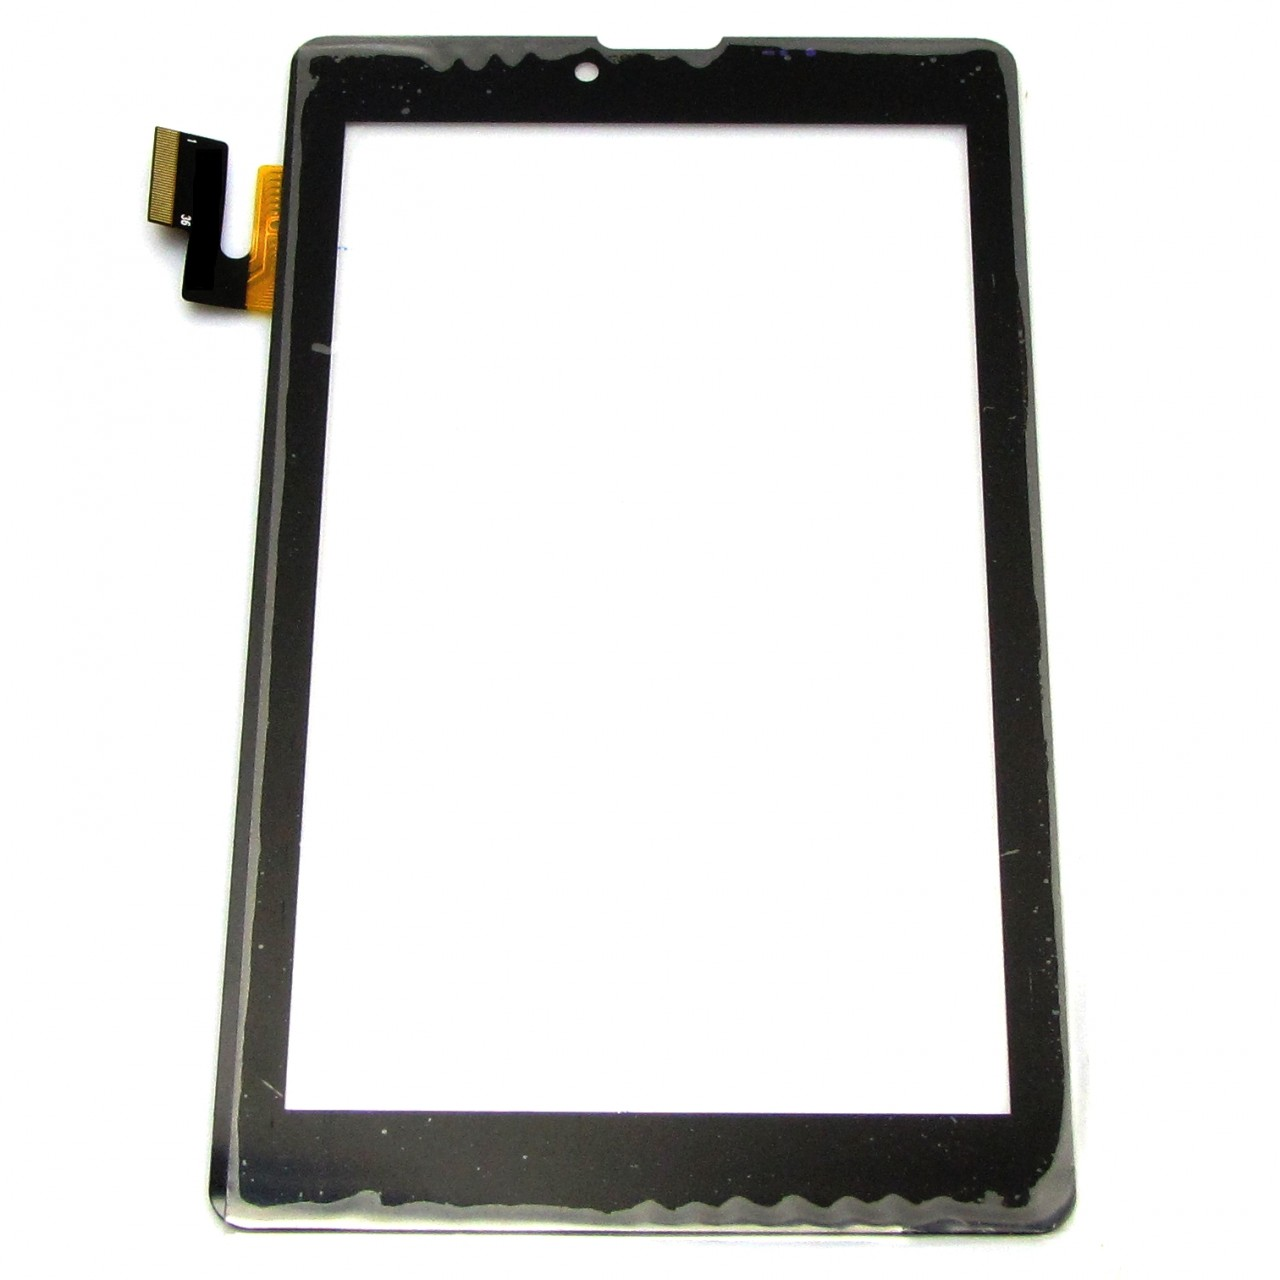 Touchscreen Digitizer Evolio Mondo 3G Geam Sticla Tableta imagine powerlaptop.ro 2021